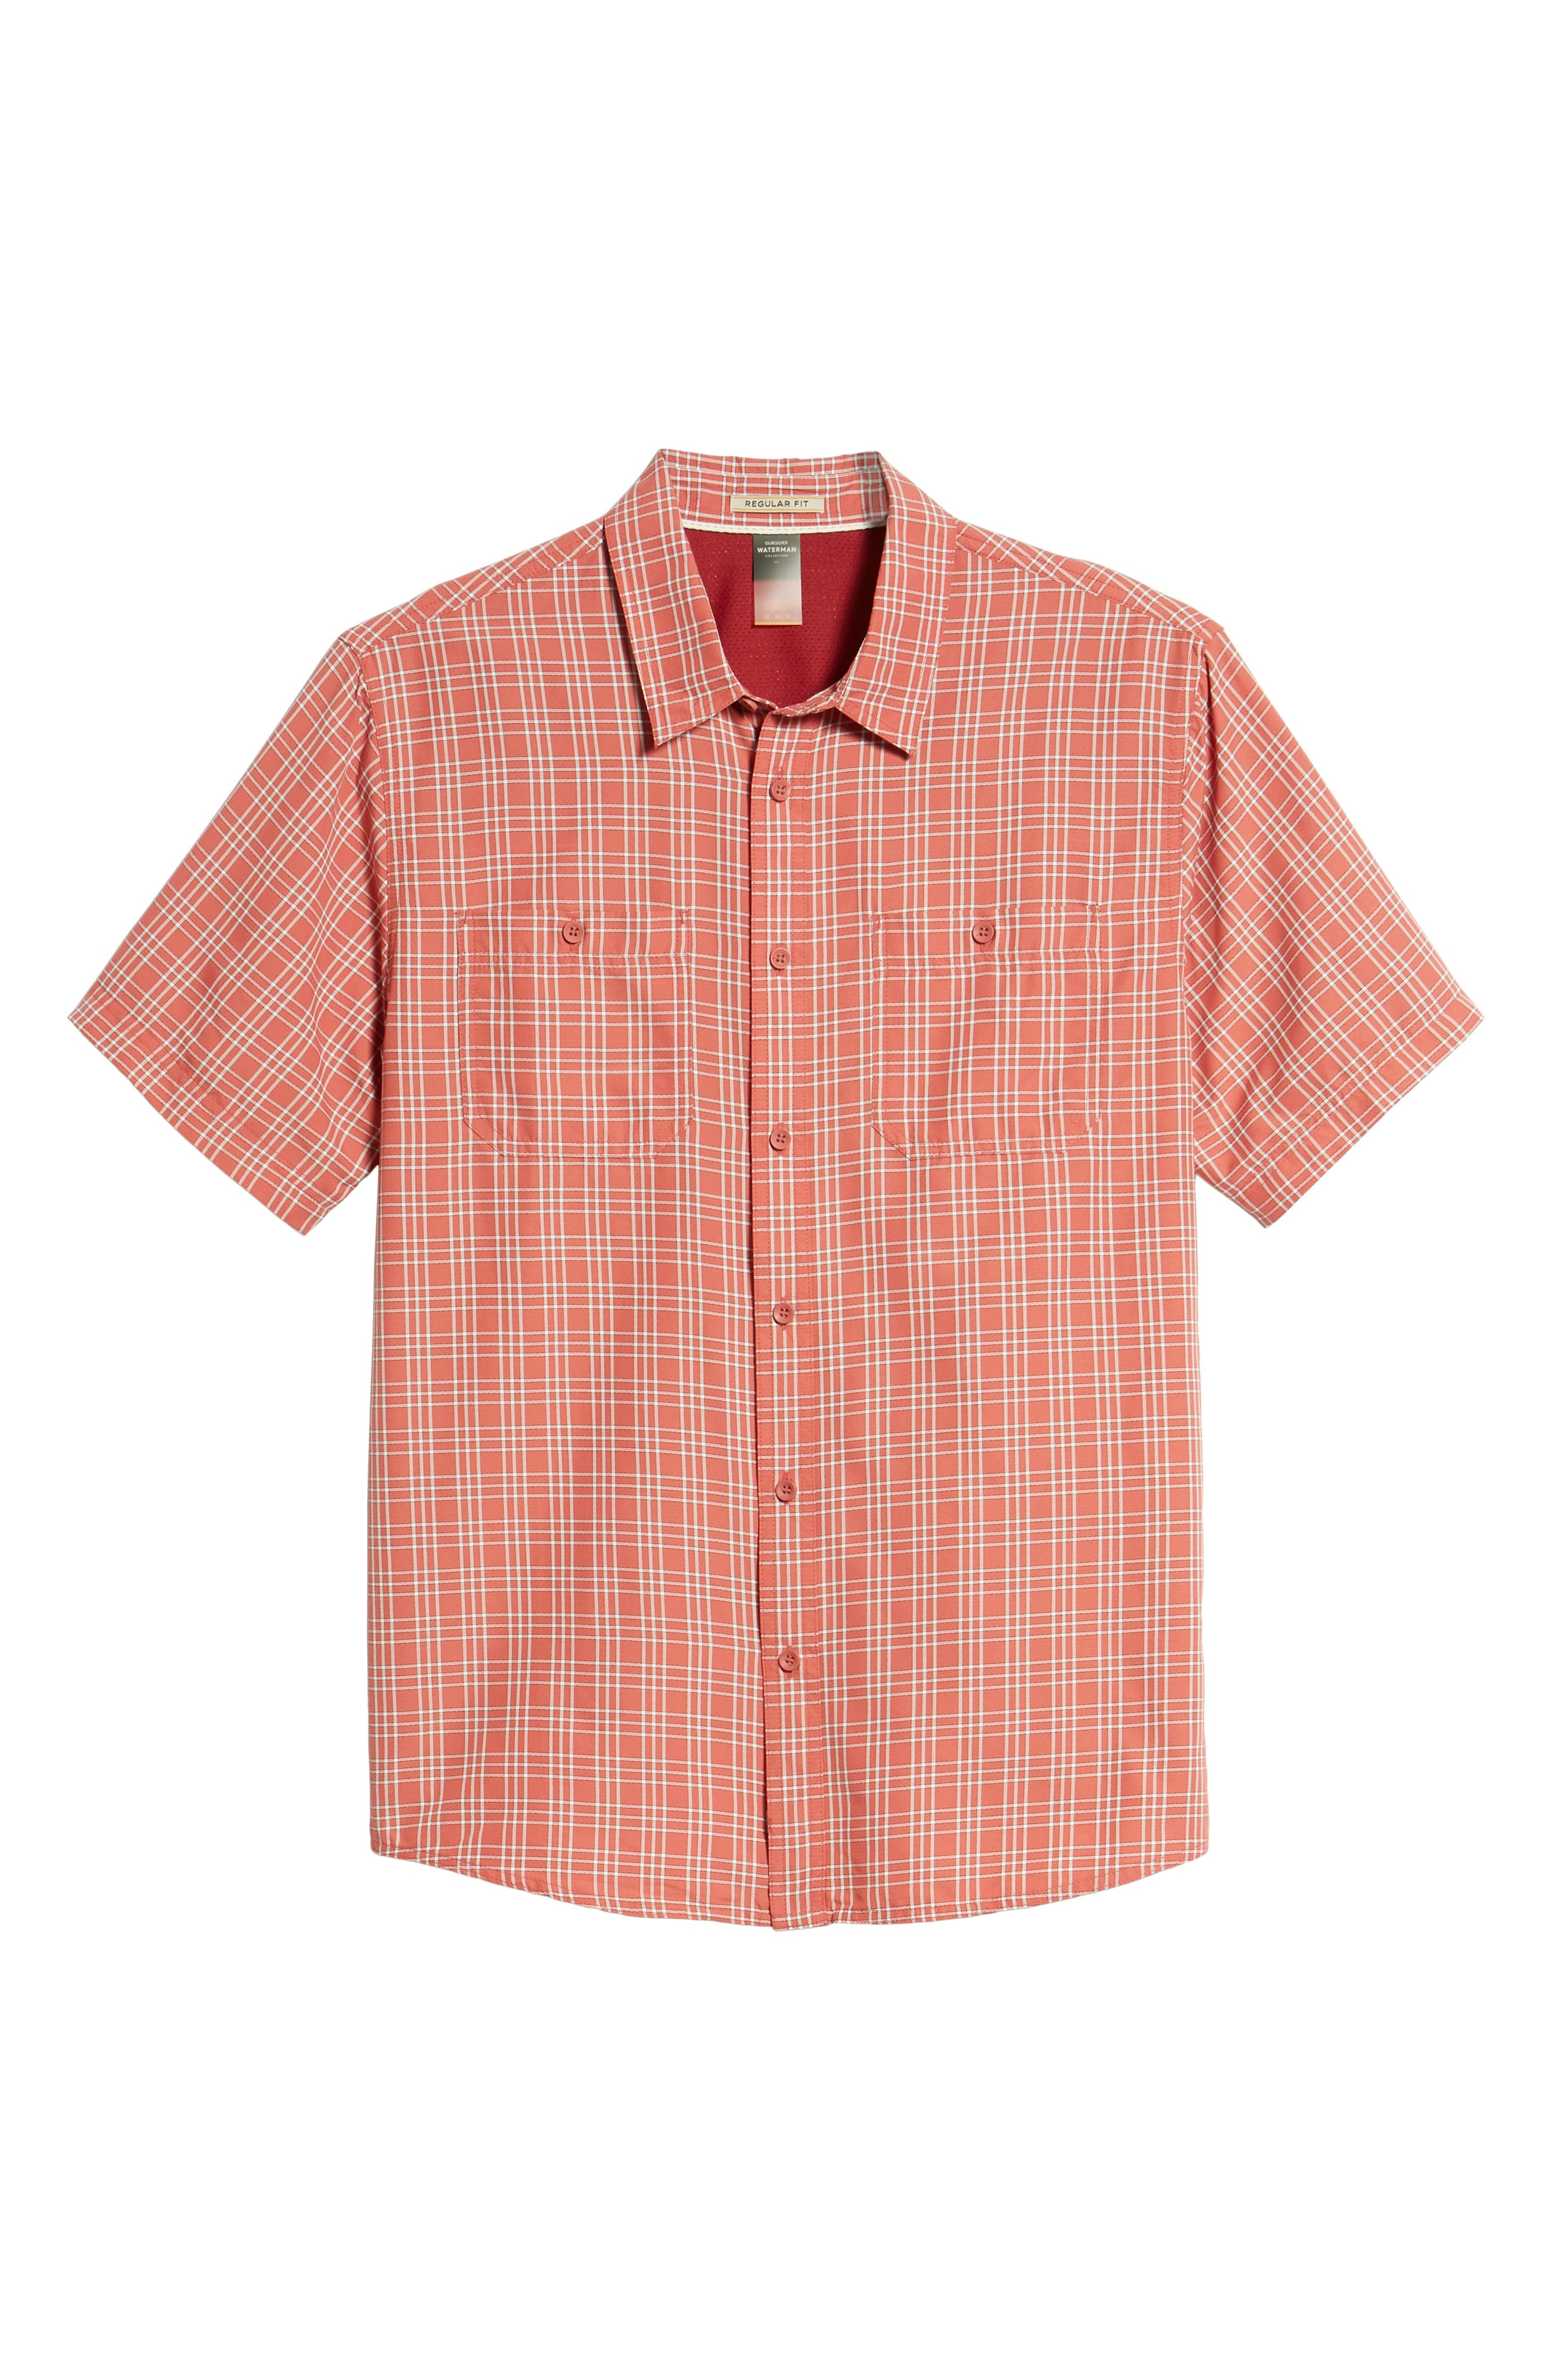 Wake Plaid Regular Fit Performance Sport Shirt,                             Alternate thumbnail 6, color,                             Mineral Red